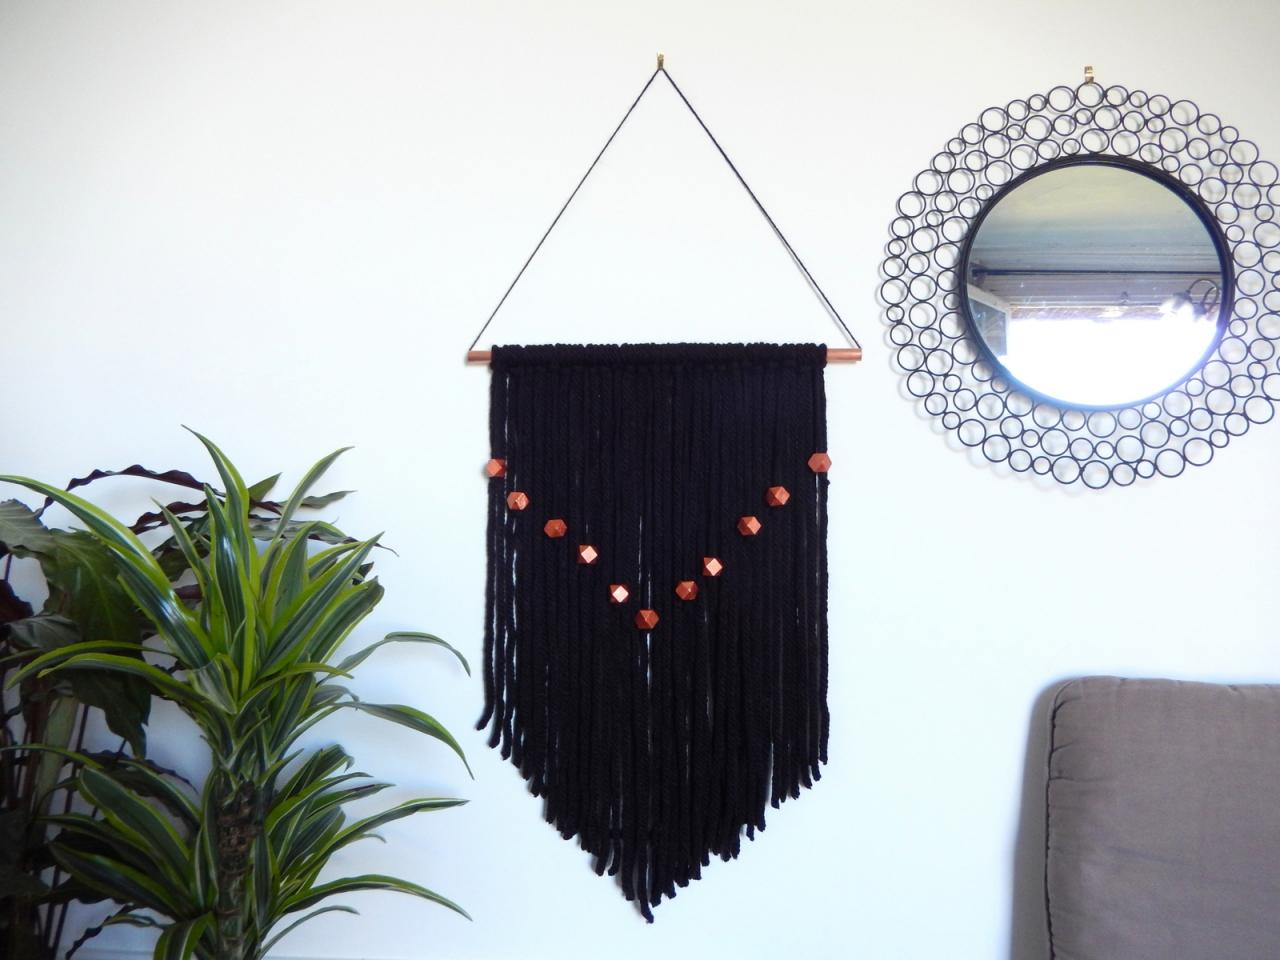 diy un tissage mural noir et cuivre so easy mon carnet d co diy organisation id es. Black Bedroom Furniture Sets. Home Design Ideas